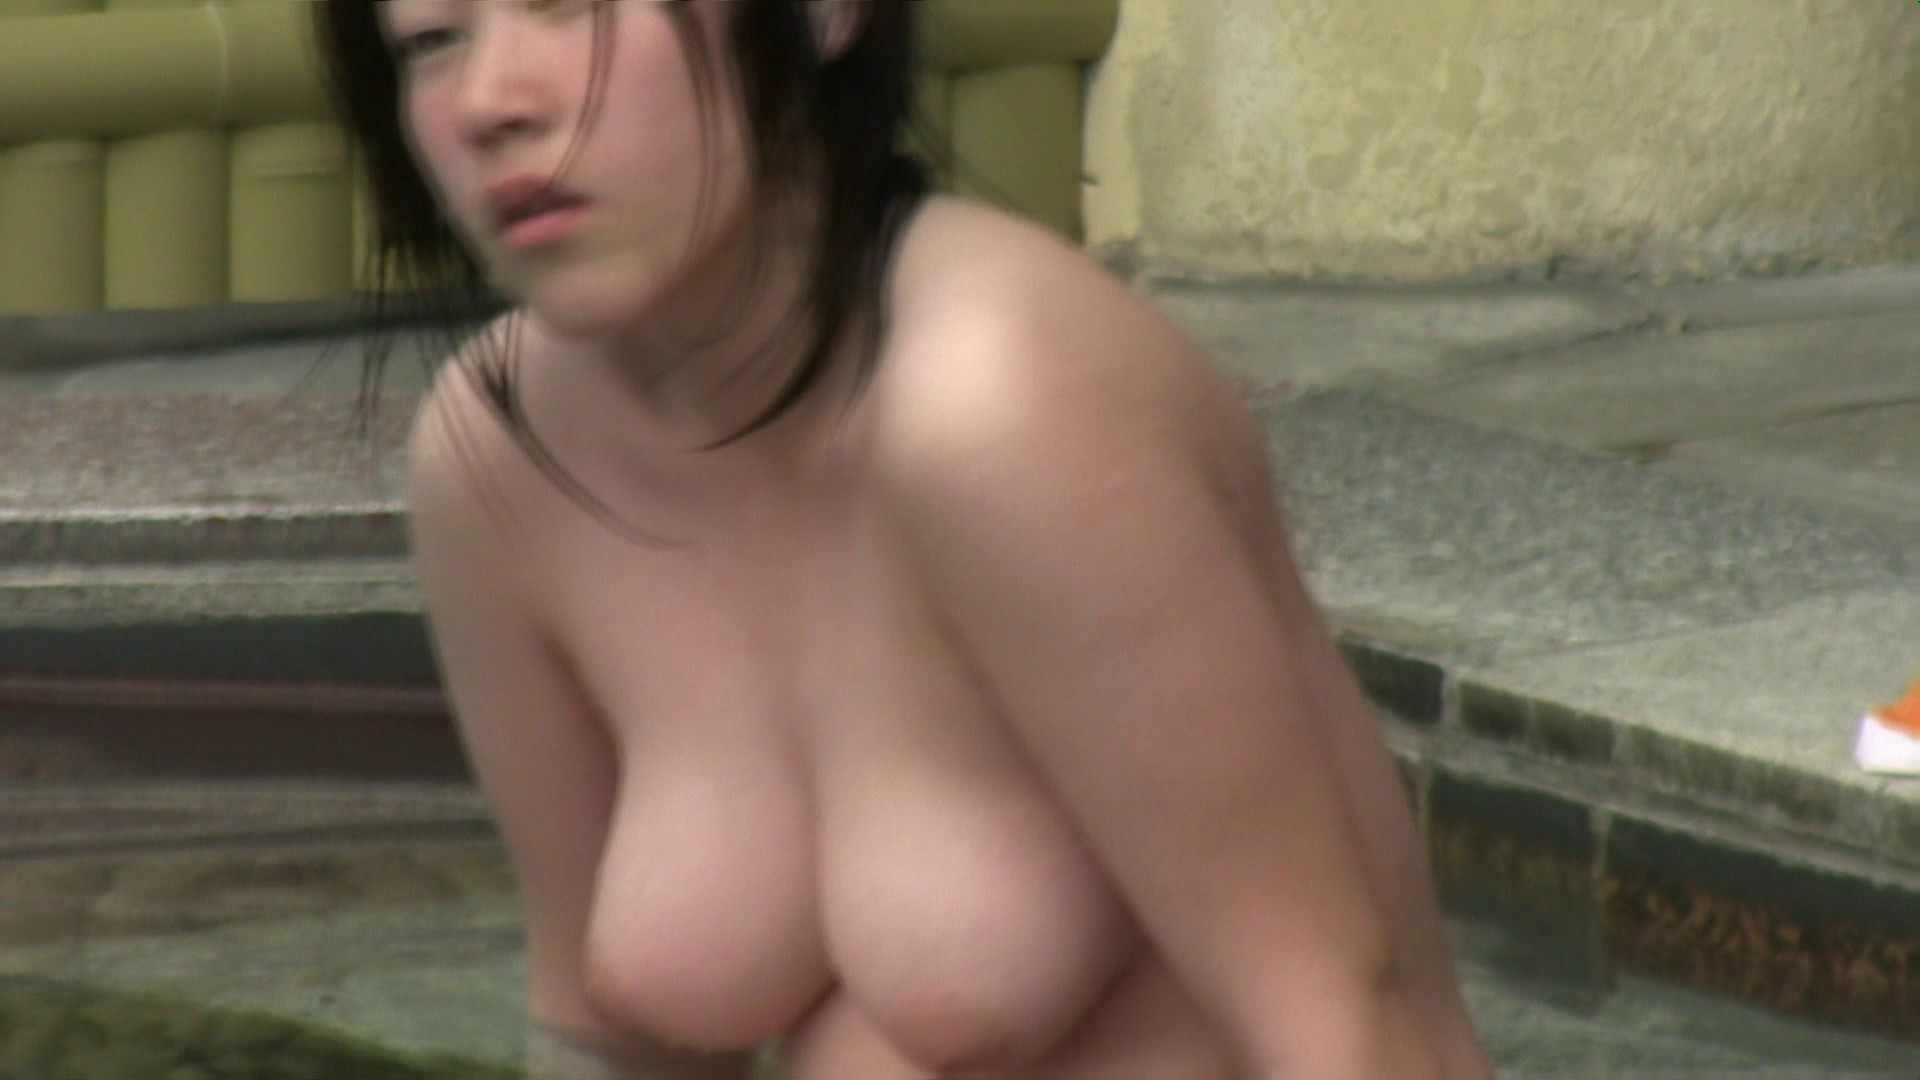 Aquaな露天風呂Vol.36 盗撮シリーズ   露天風呂編  99PIX 83